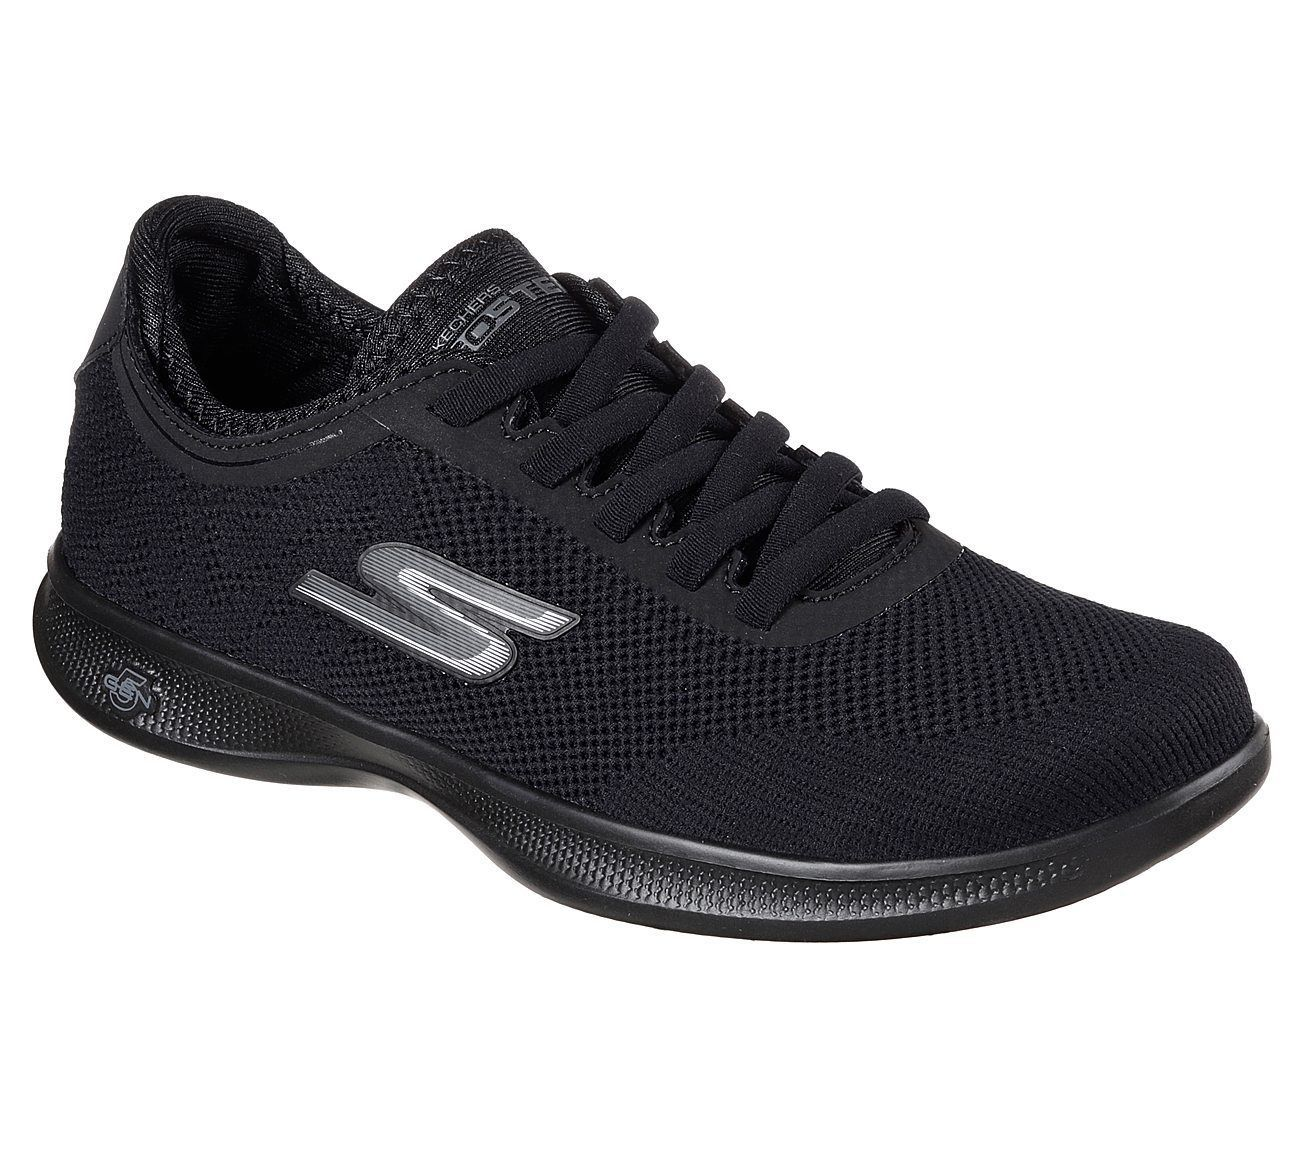 14712 Black Skechers Shoes Go Step Lite